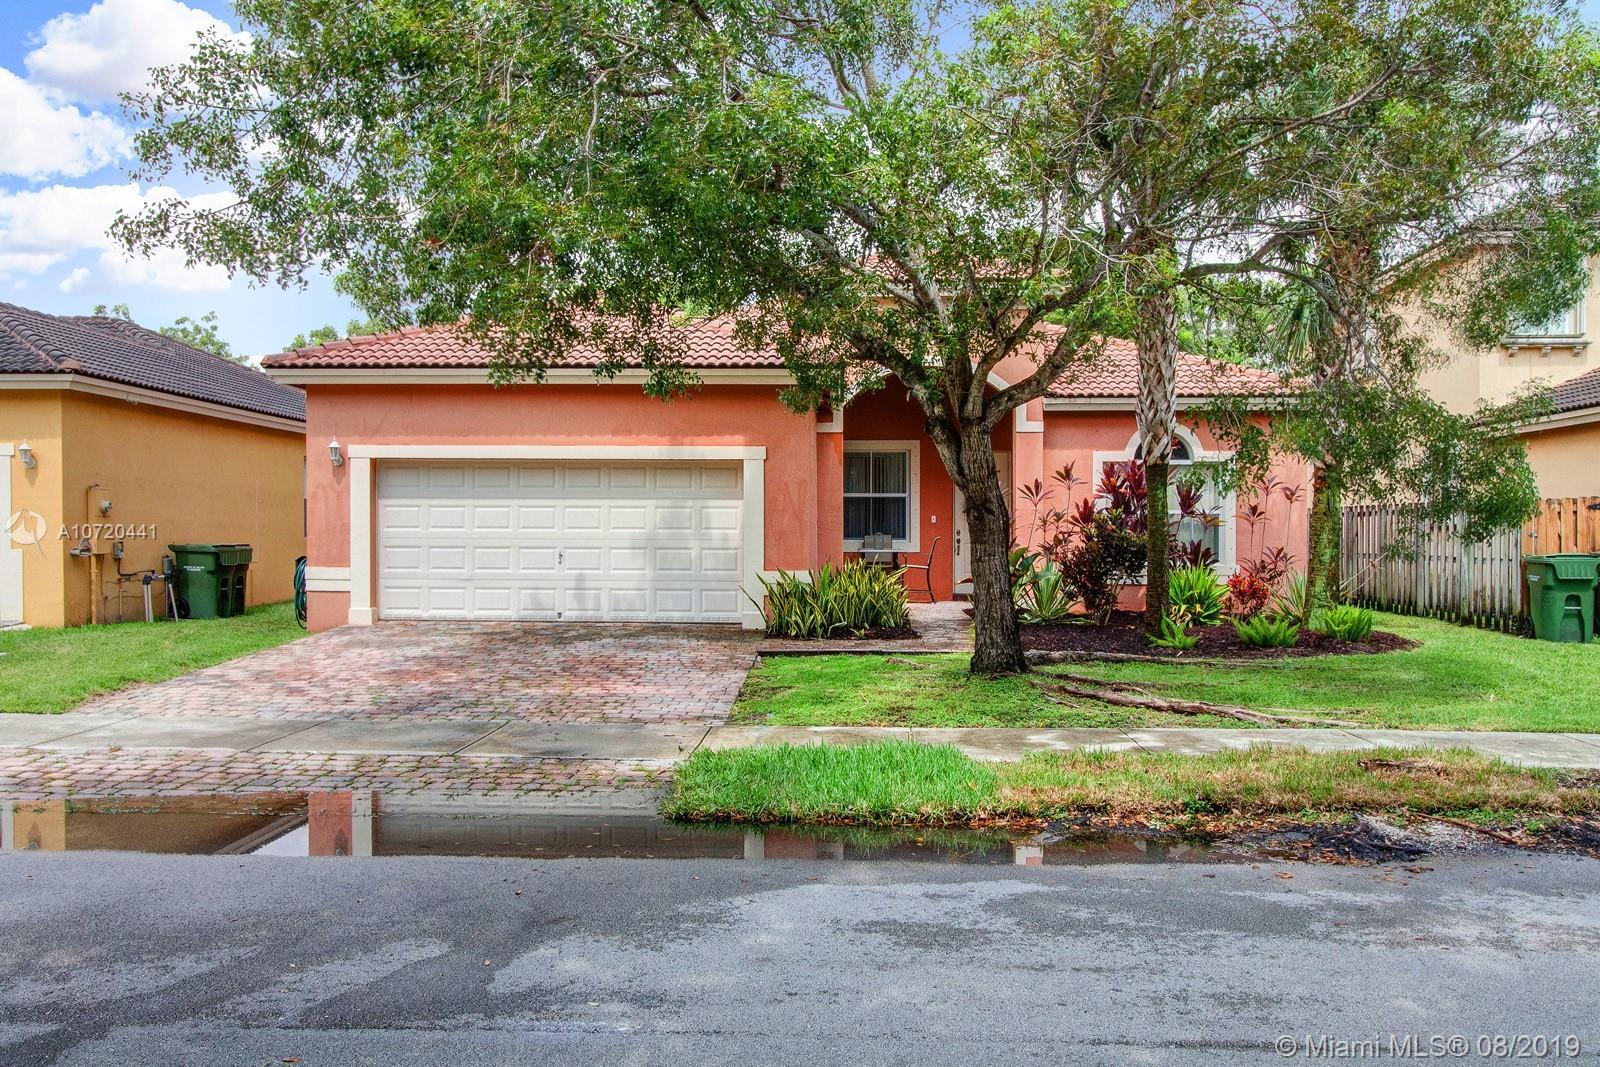 1551 SE 17th Ave, Homestead, FL 33035 - Homestead, FL real estate listing